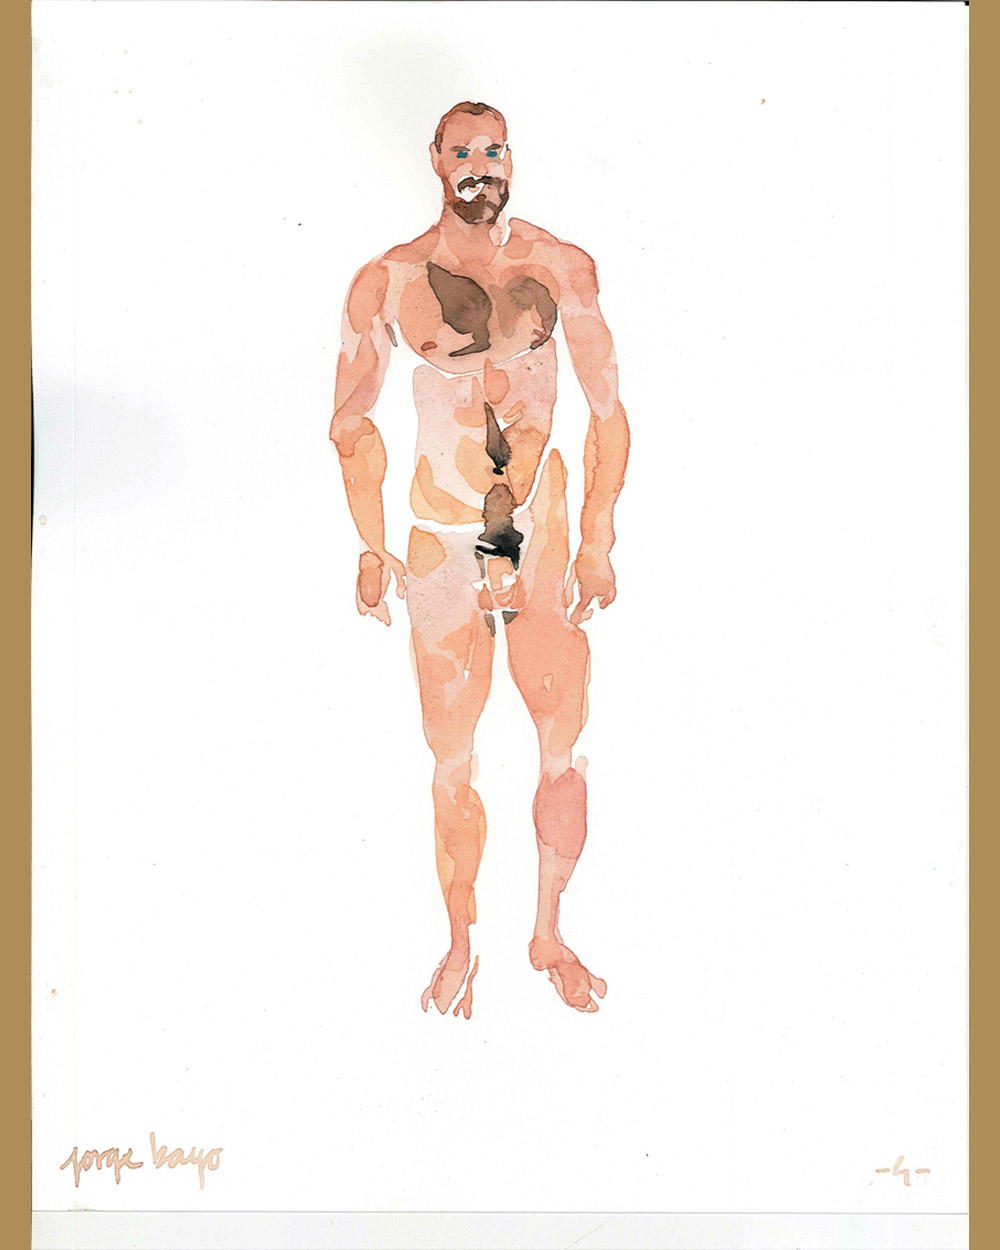 Acuarela hombre desnudo - Jorge Bayo - Gay Art Madrid